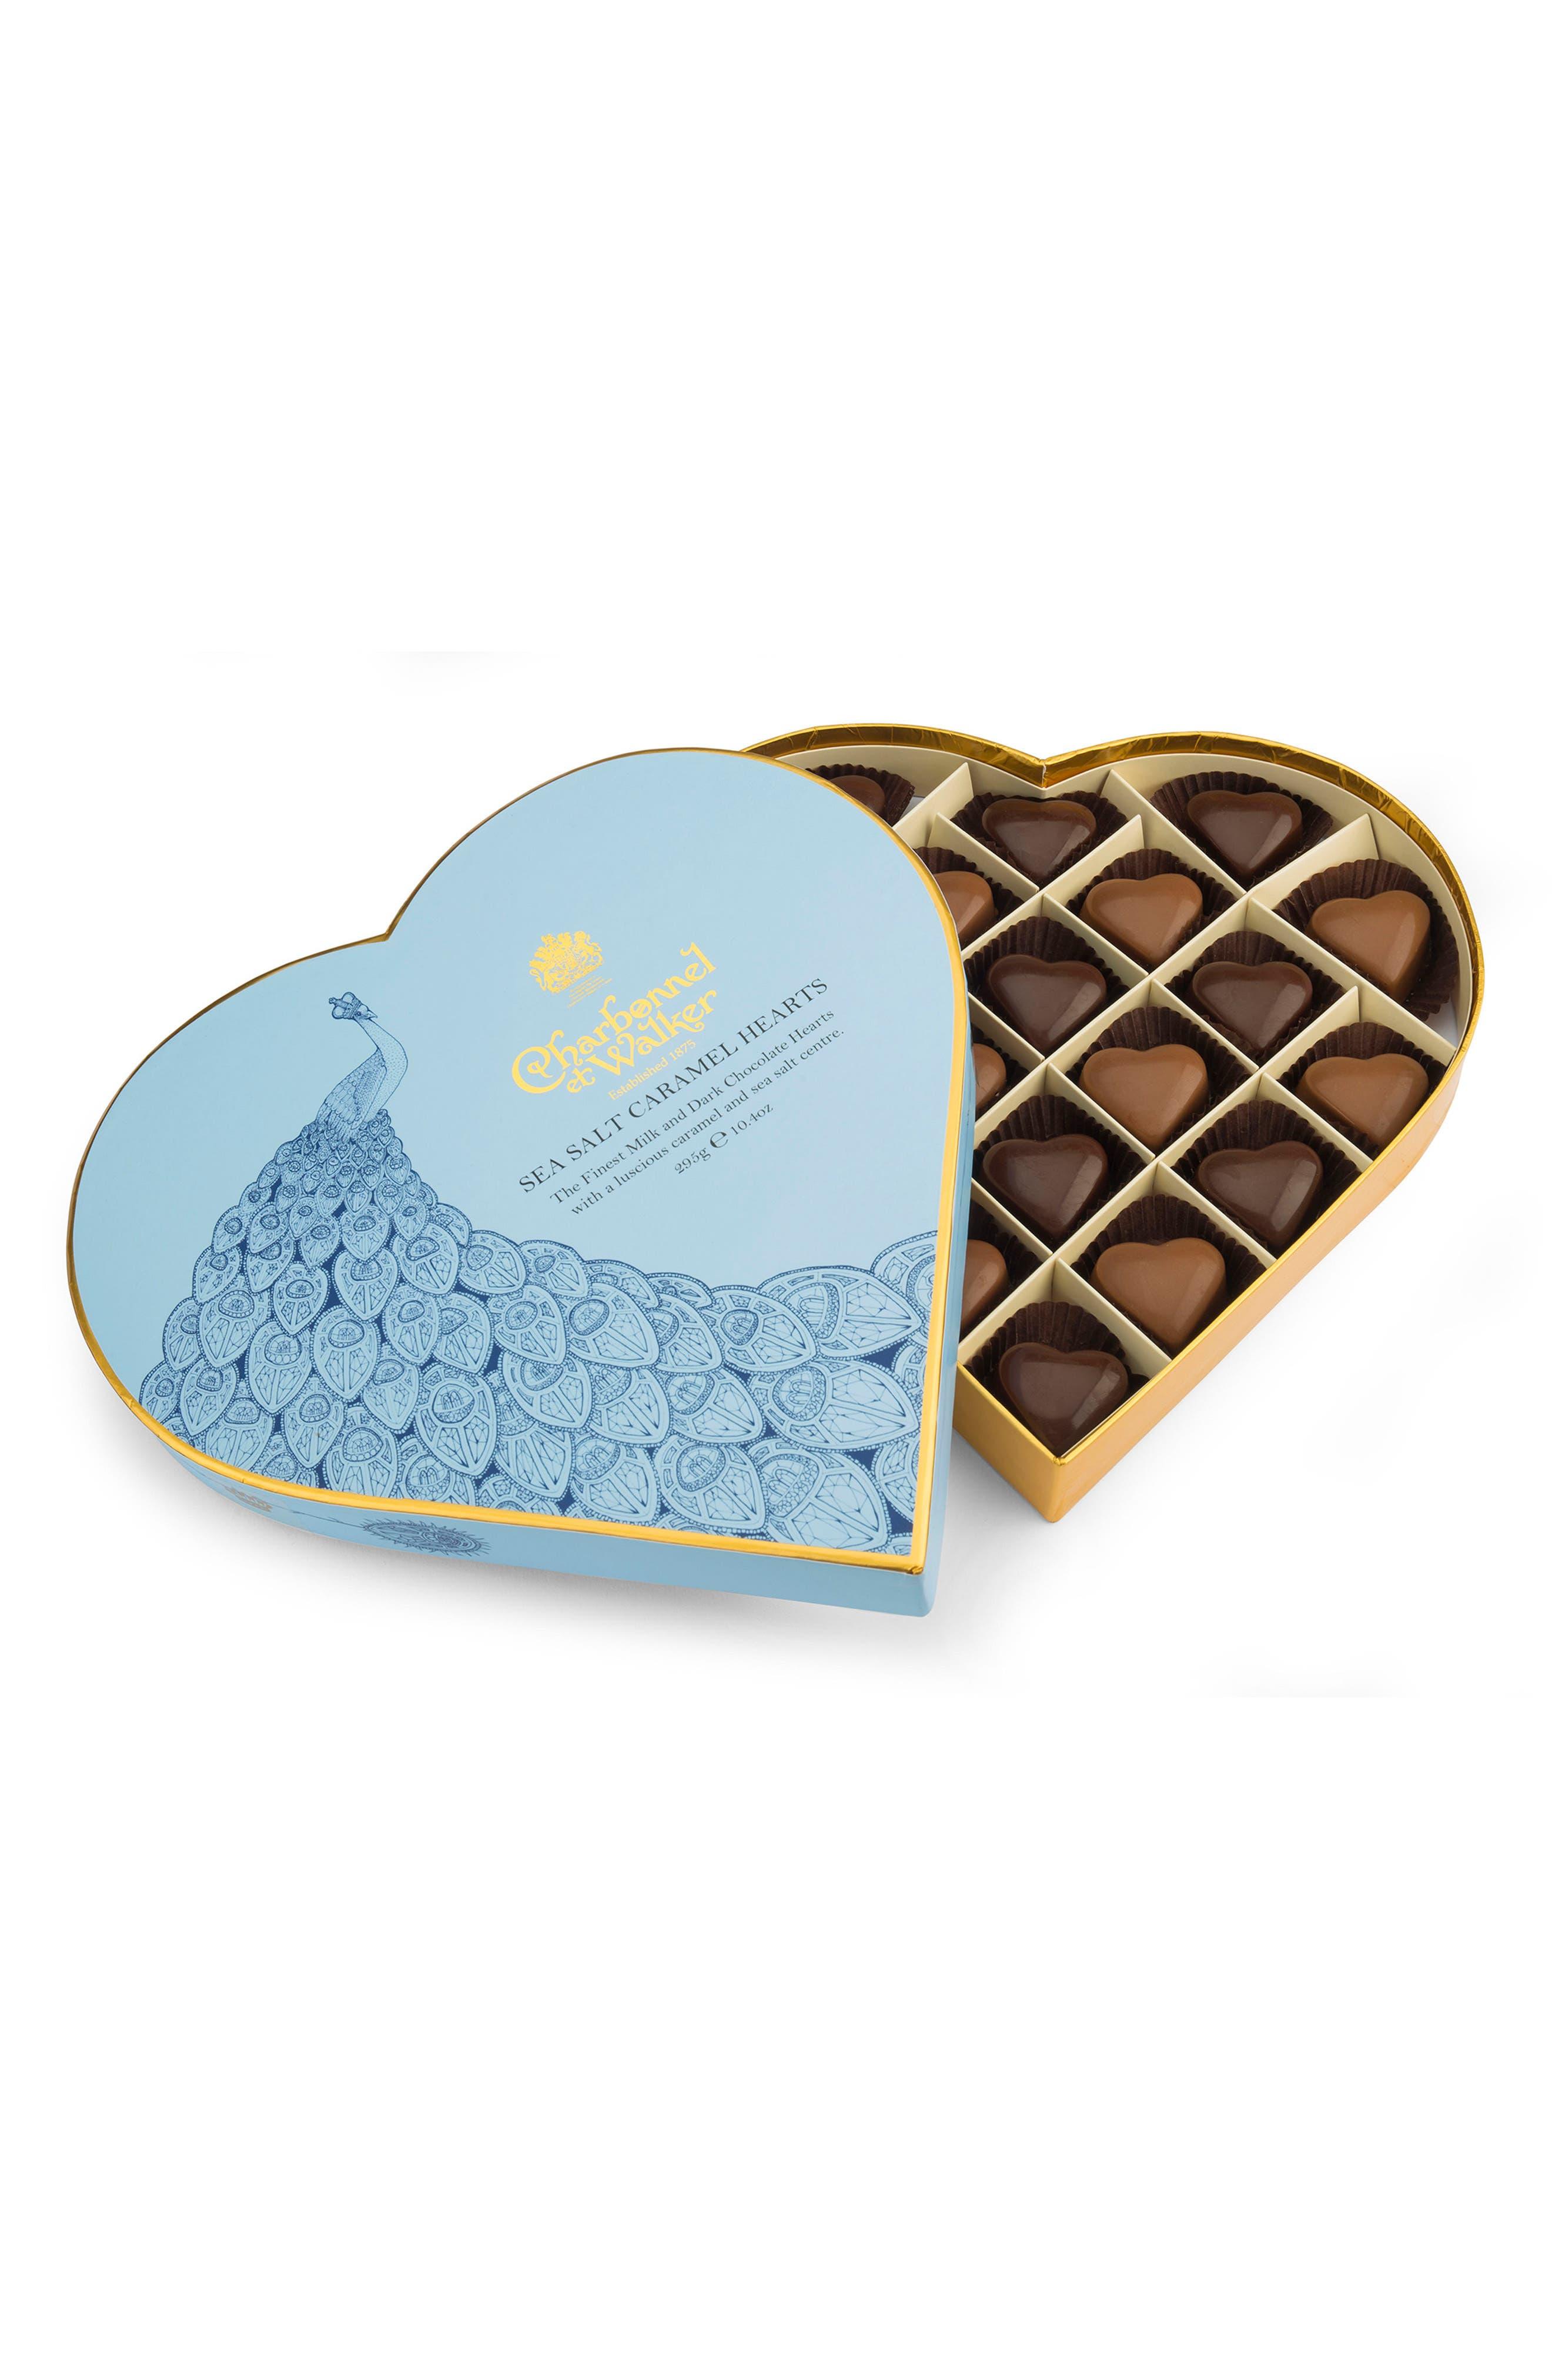 Sea Salt Caramel Chocolates in Heart Shaped Gift Box,                         Main,                         color, Blue